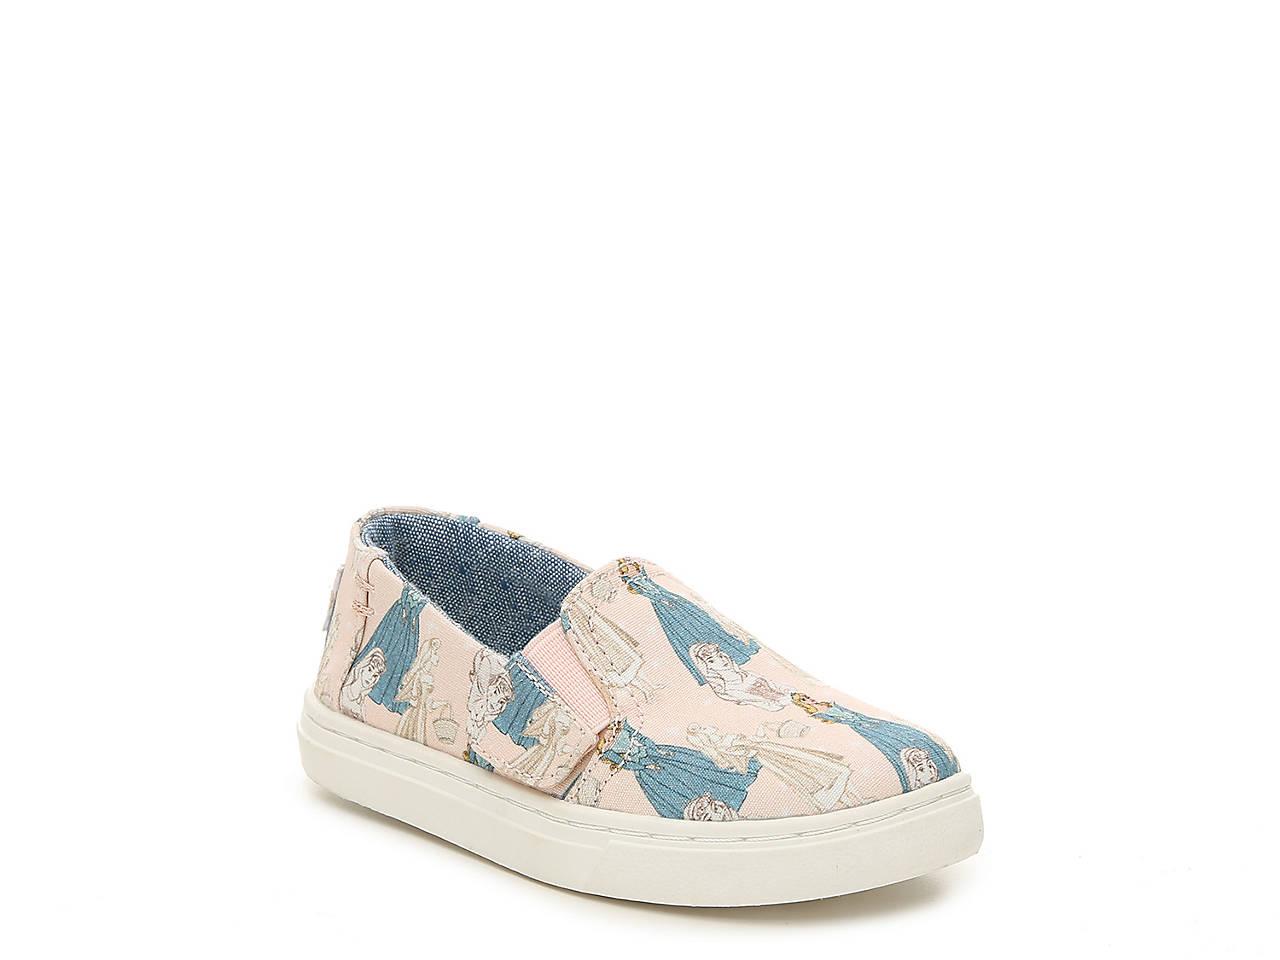 31d5243a191 TOMS Luca Sleeping Beauty Toddler Slip-On Sneaker Kids Shoes